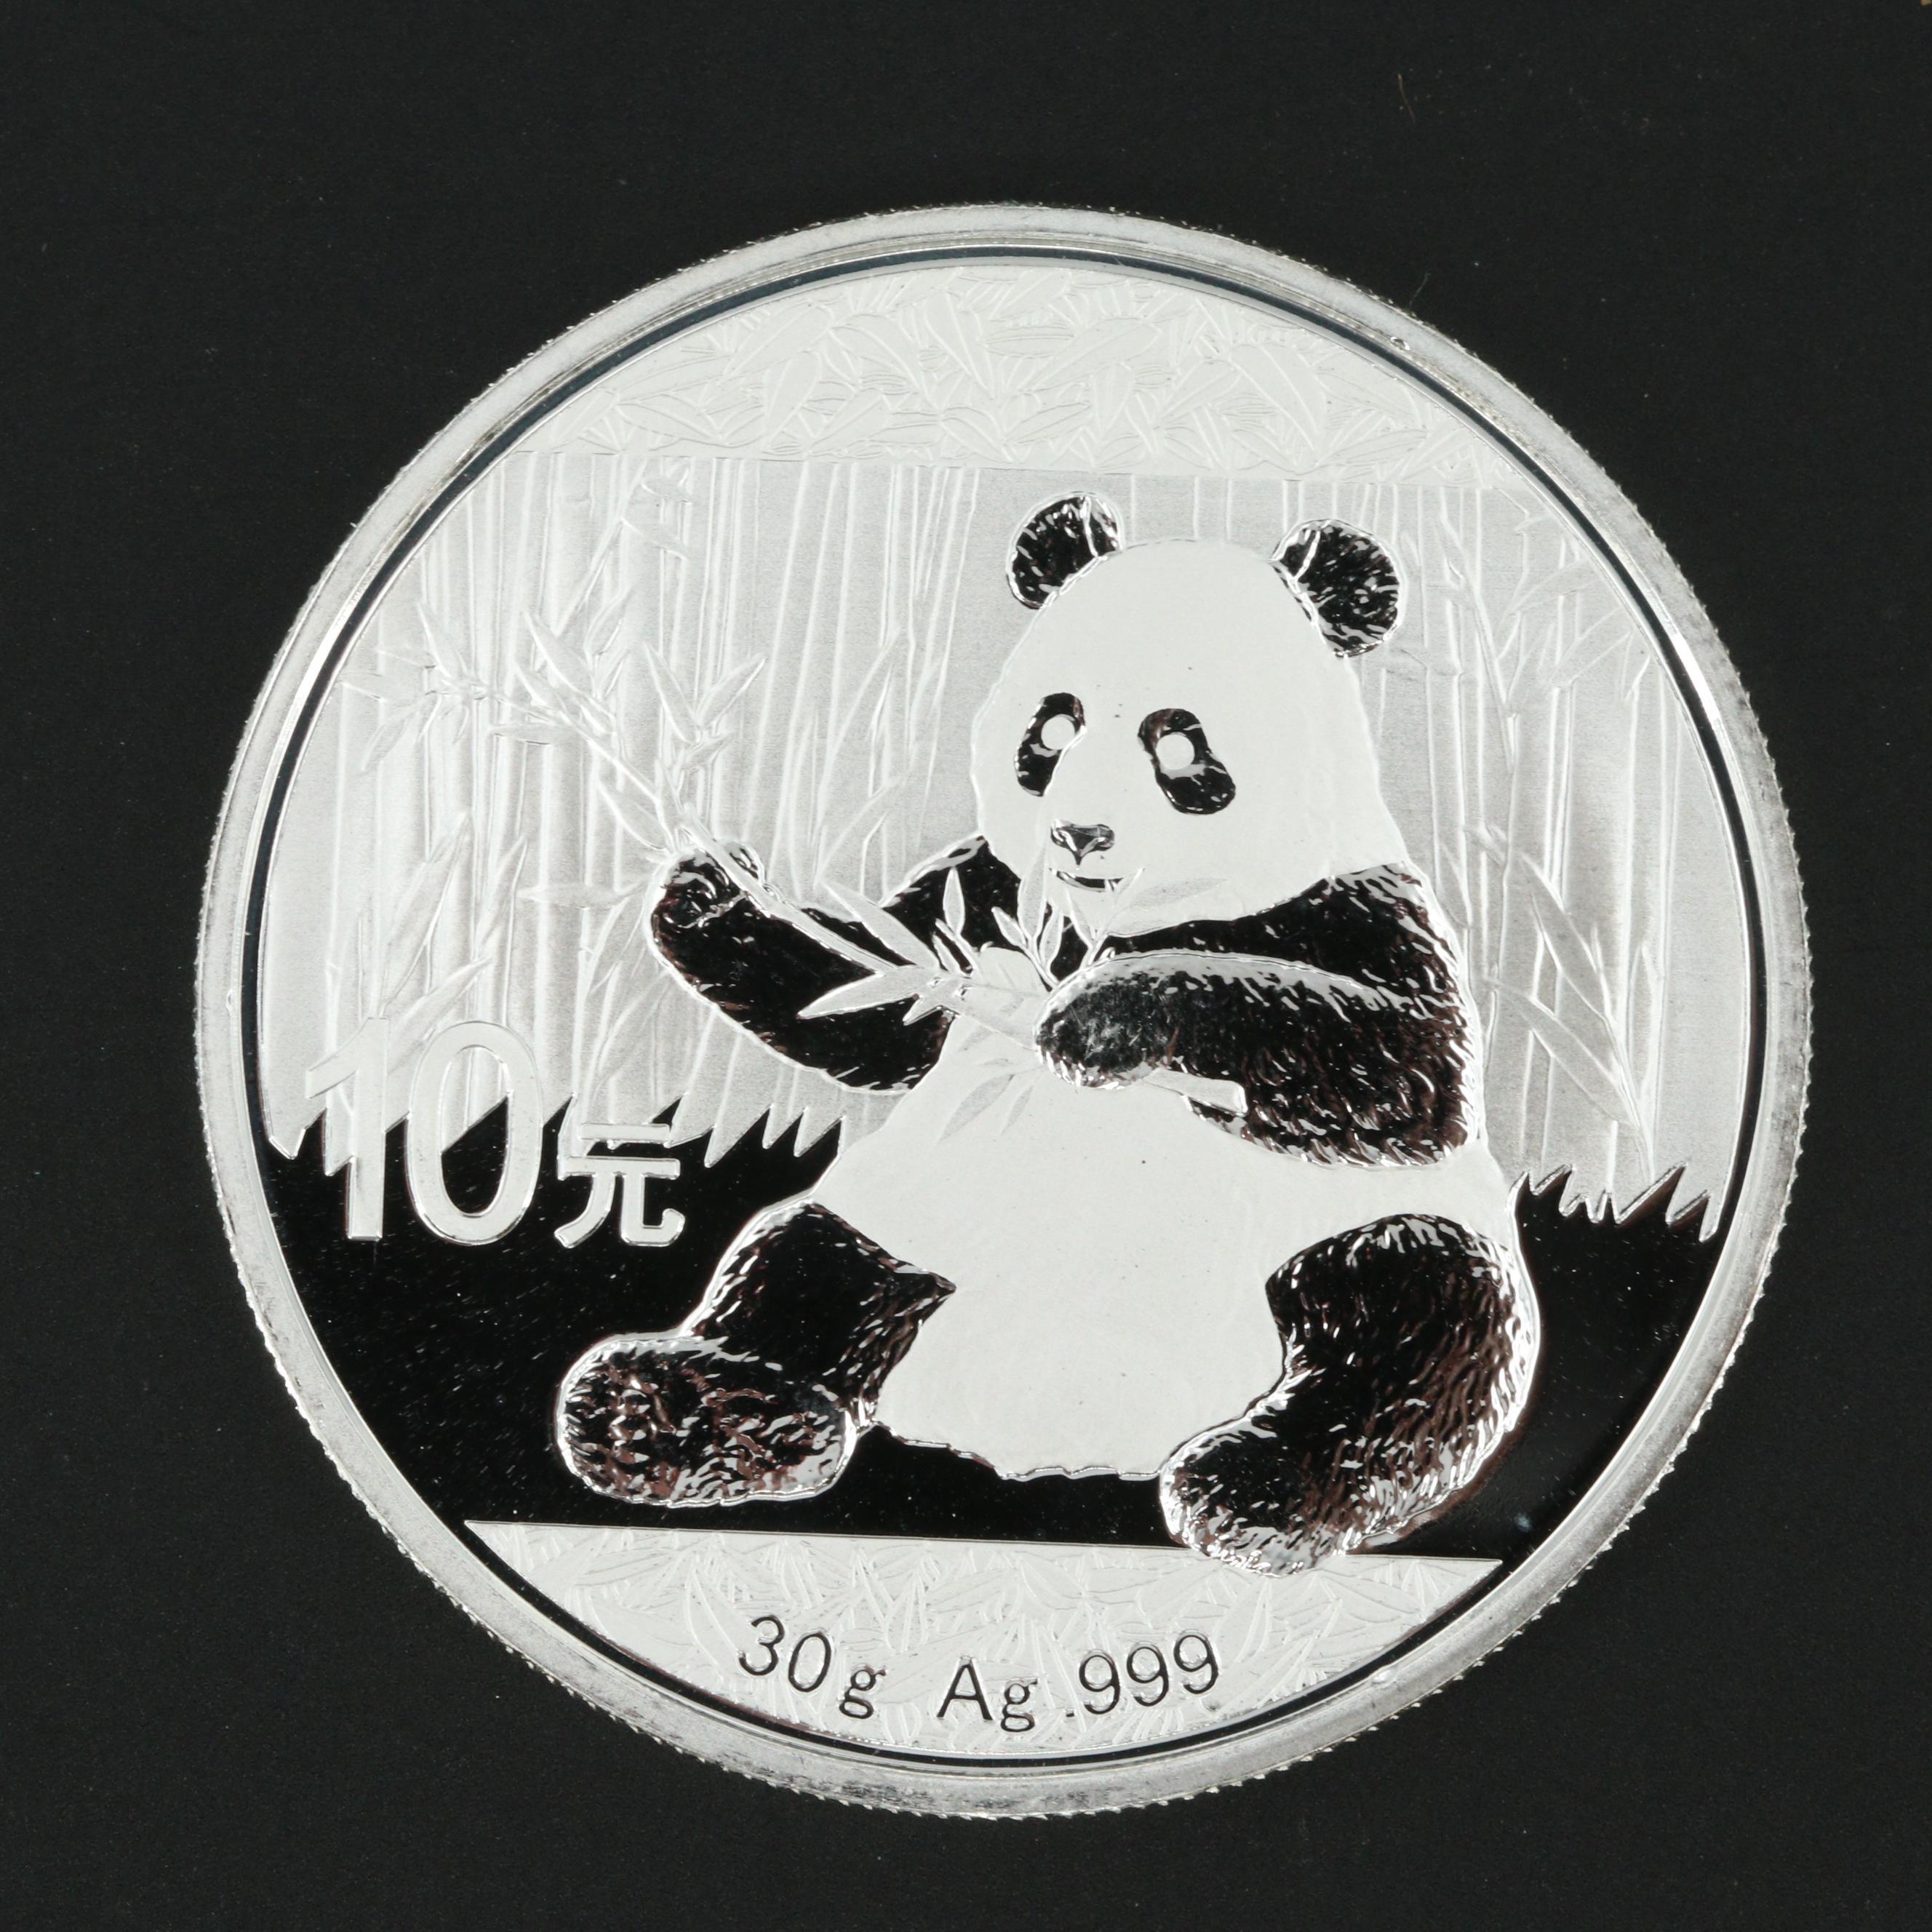 2017 China Panda 10 Yuan Silver Coin